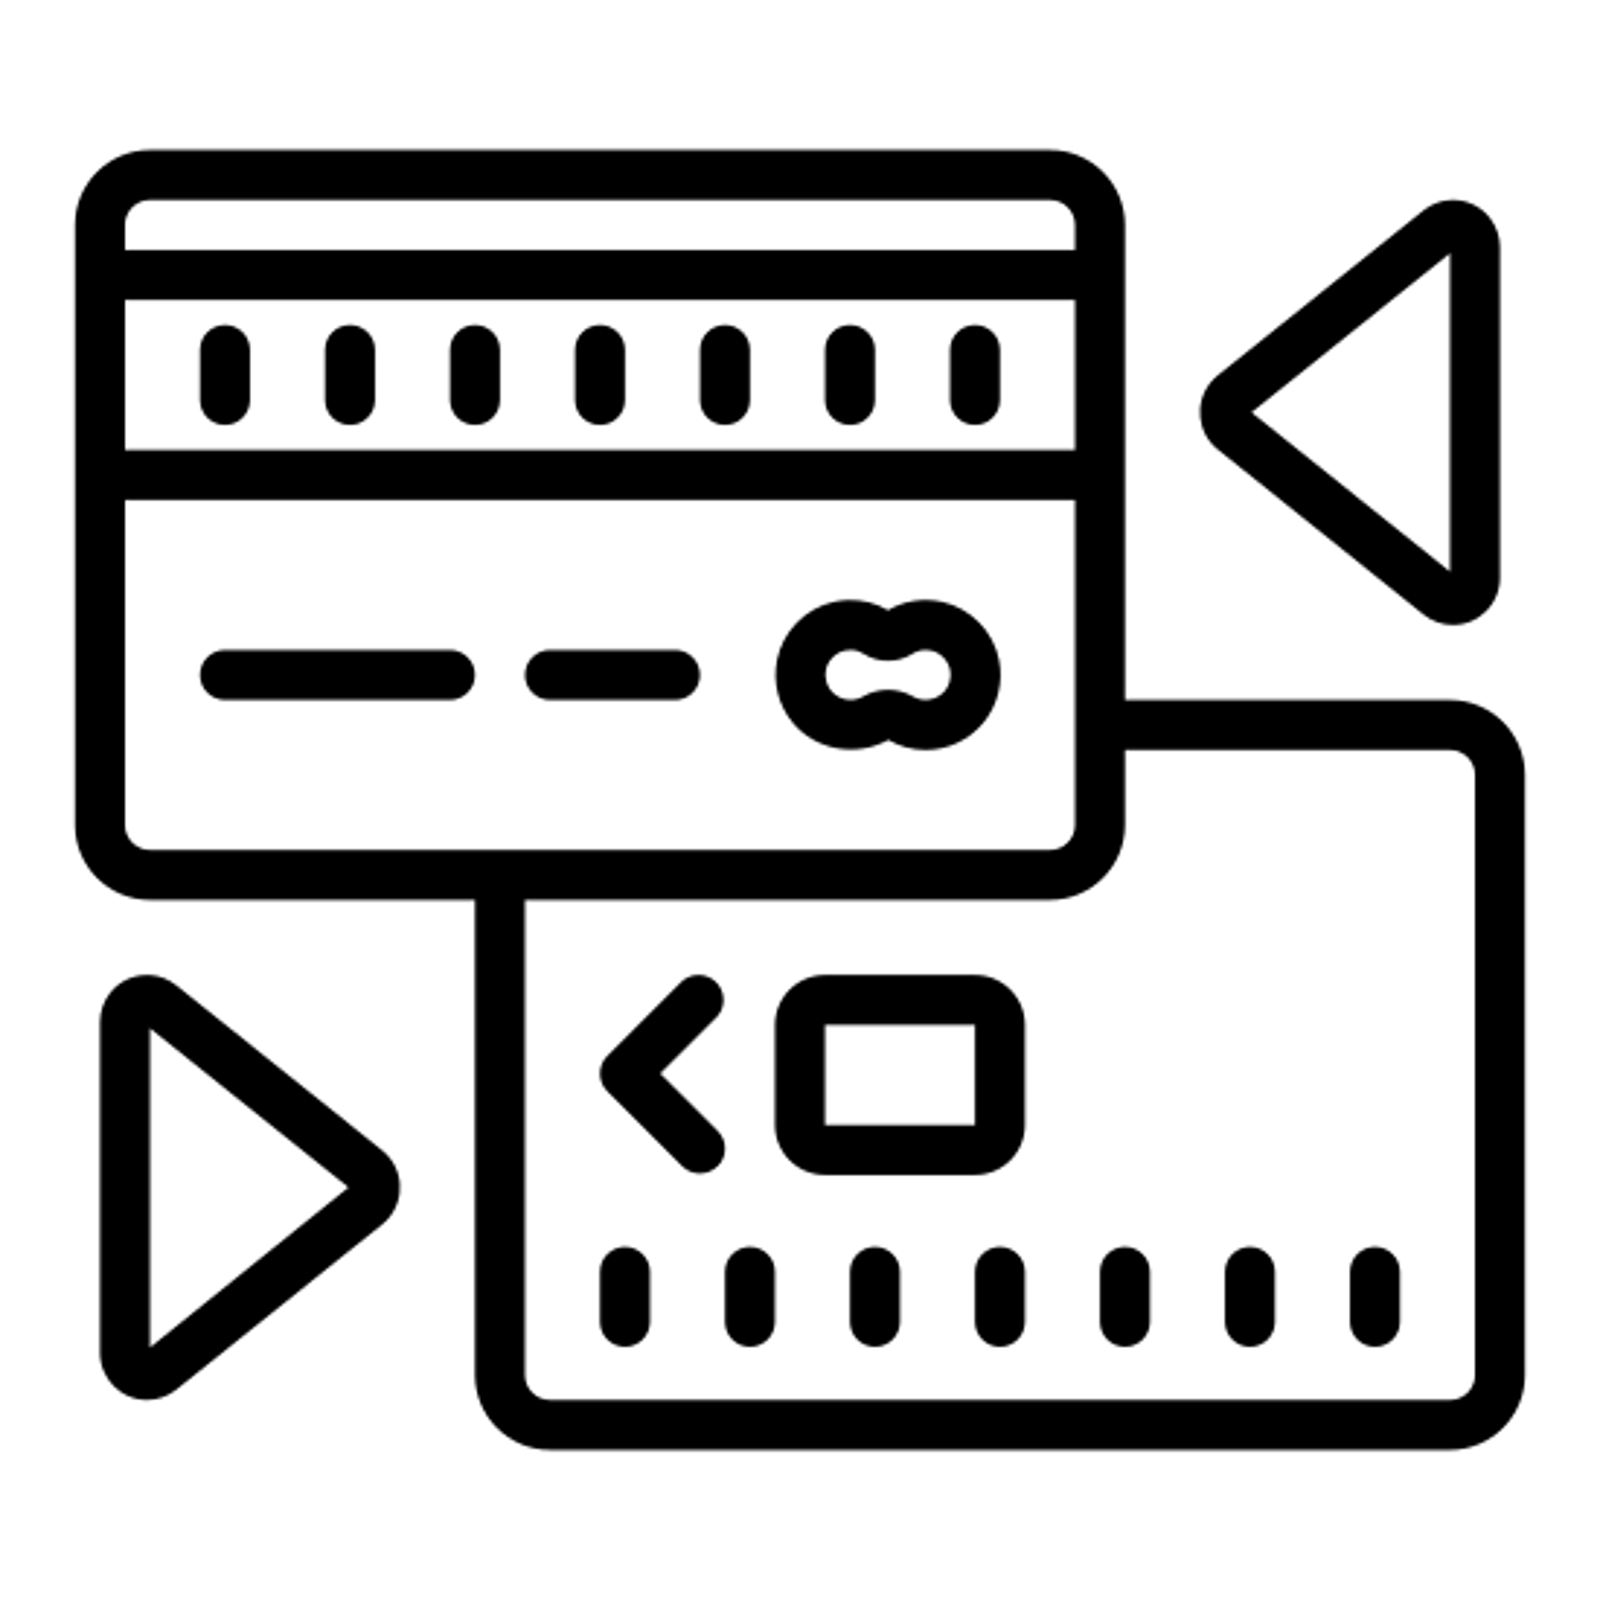 卡片交换 icon